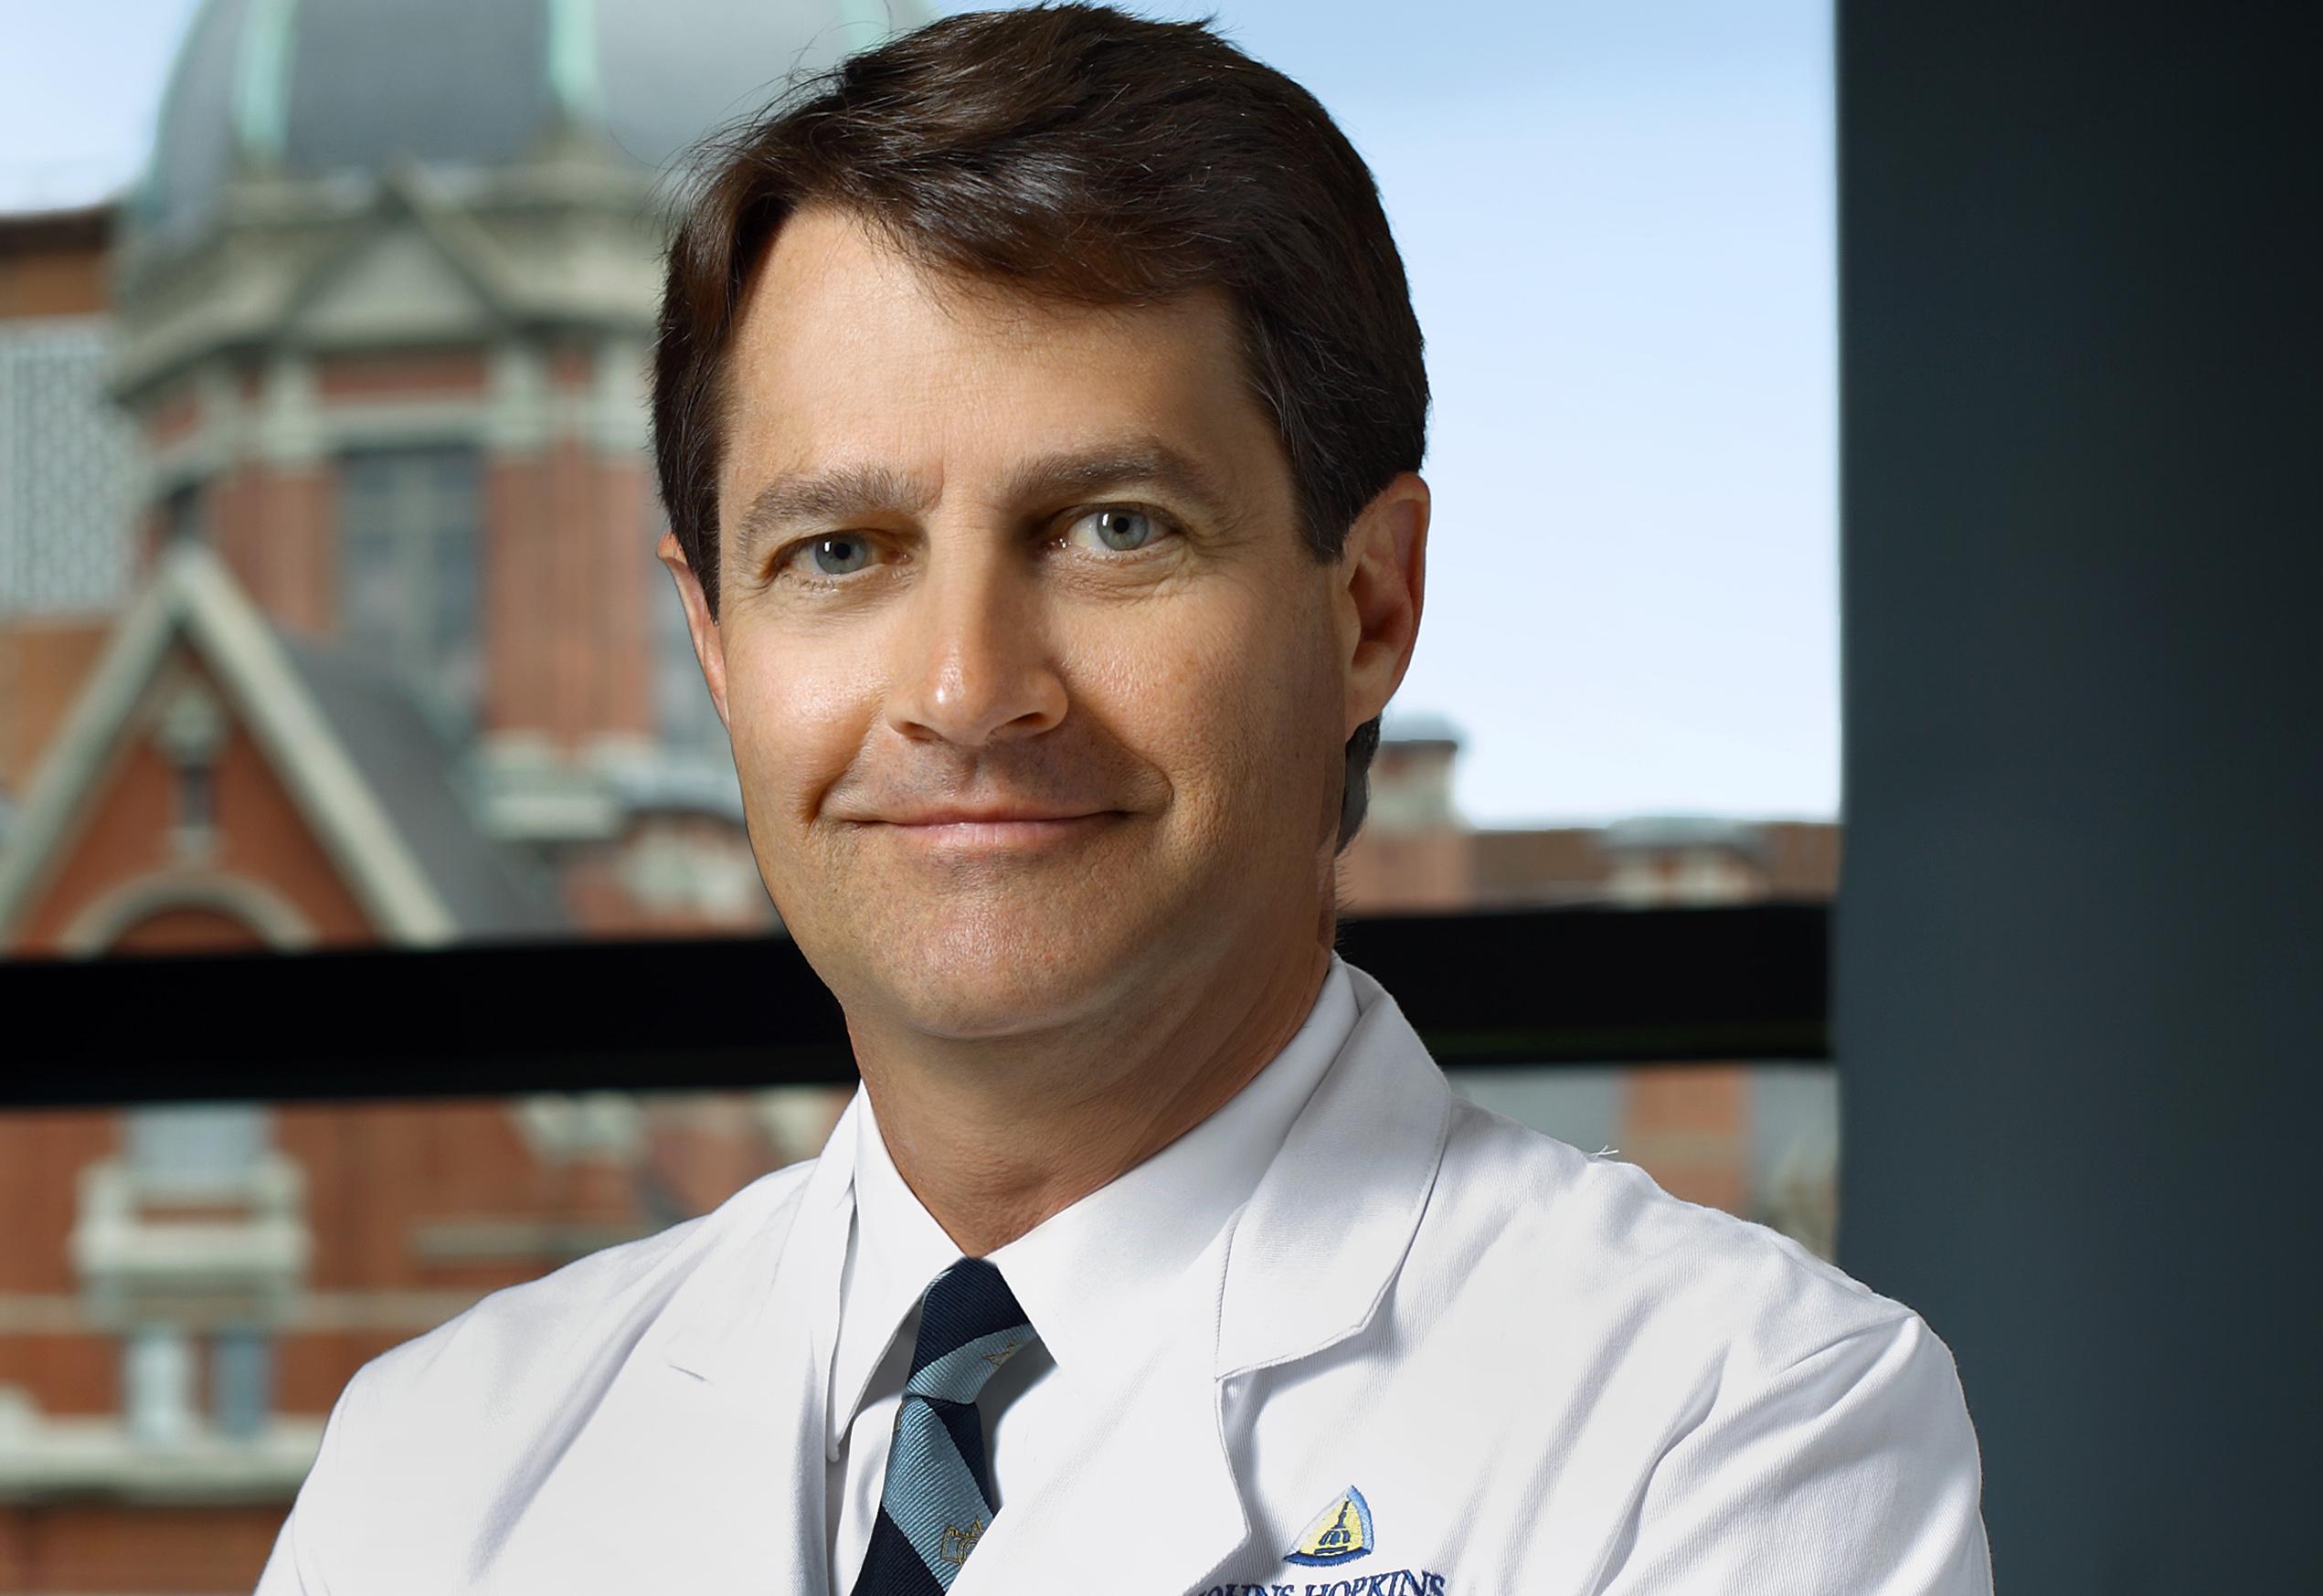 Dr. David Eisele